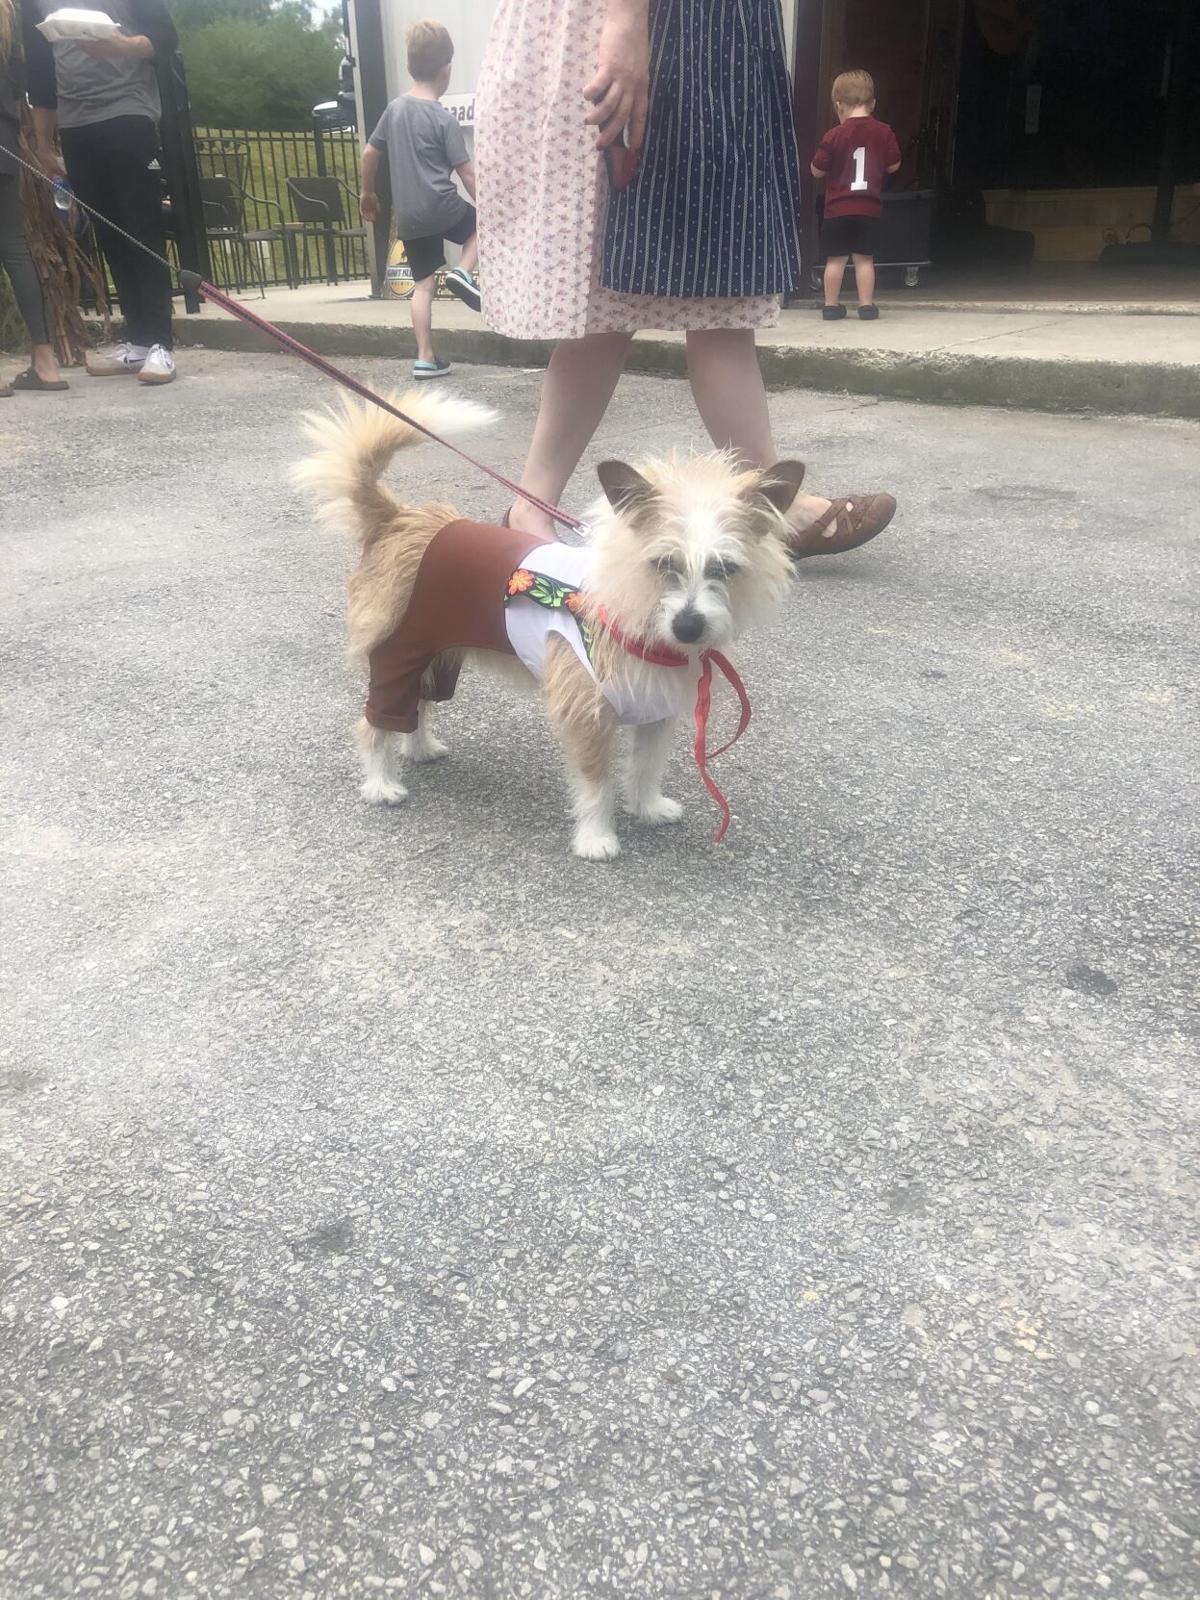 Dog at Goatoberfest